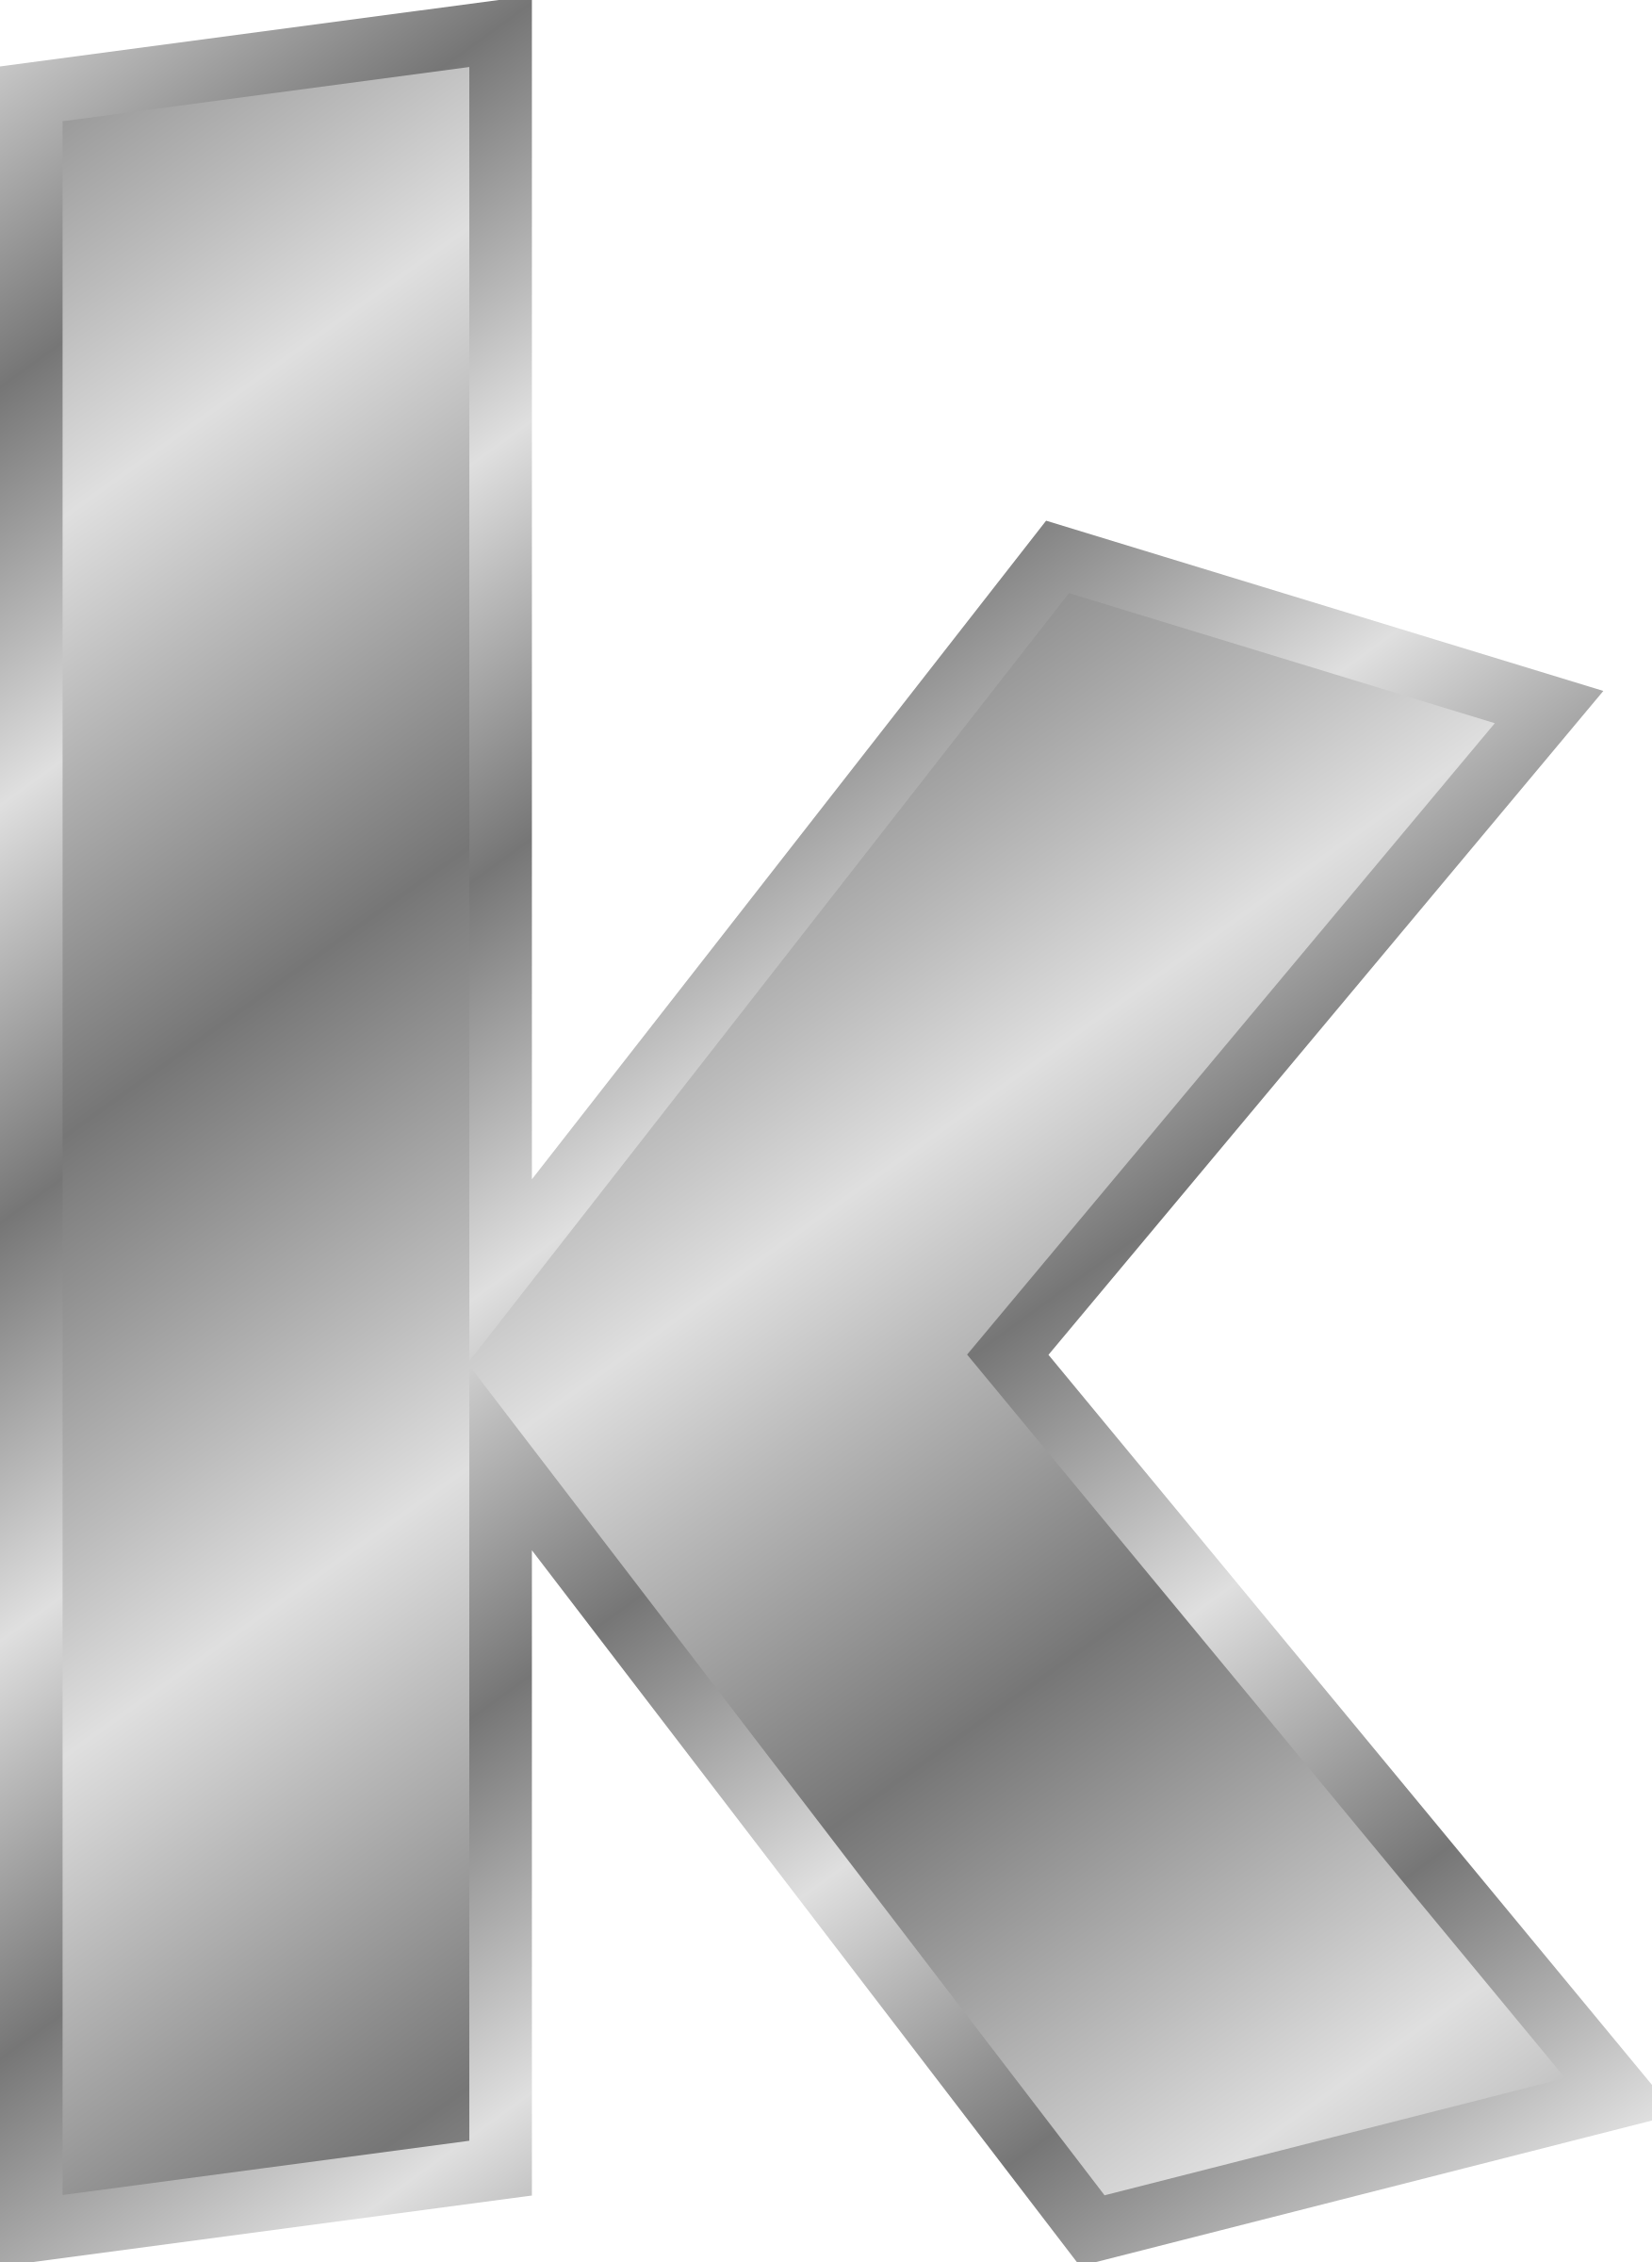 Effect Letter K